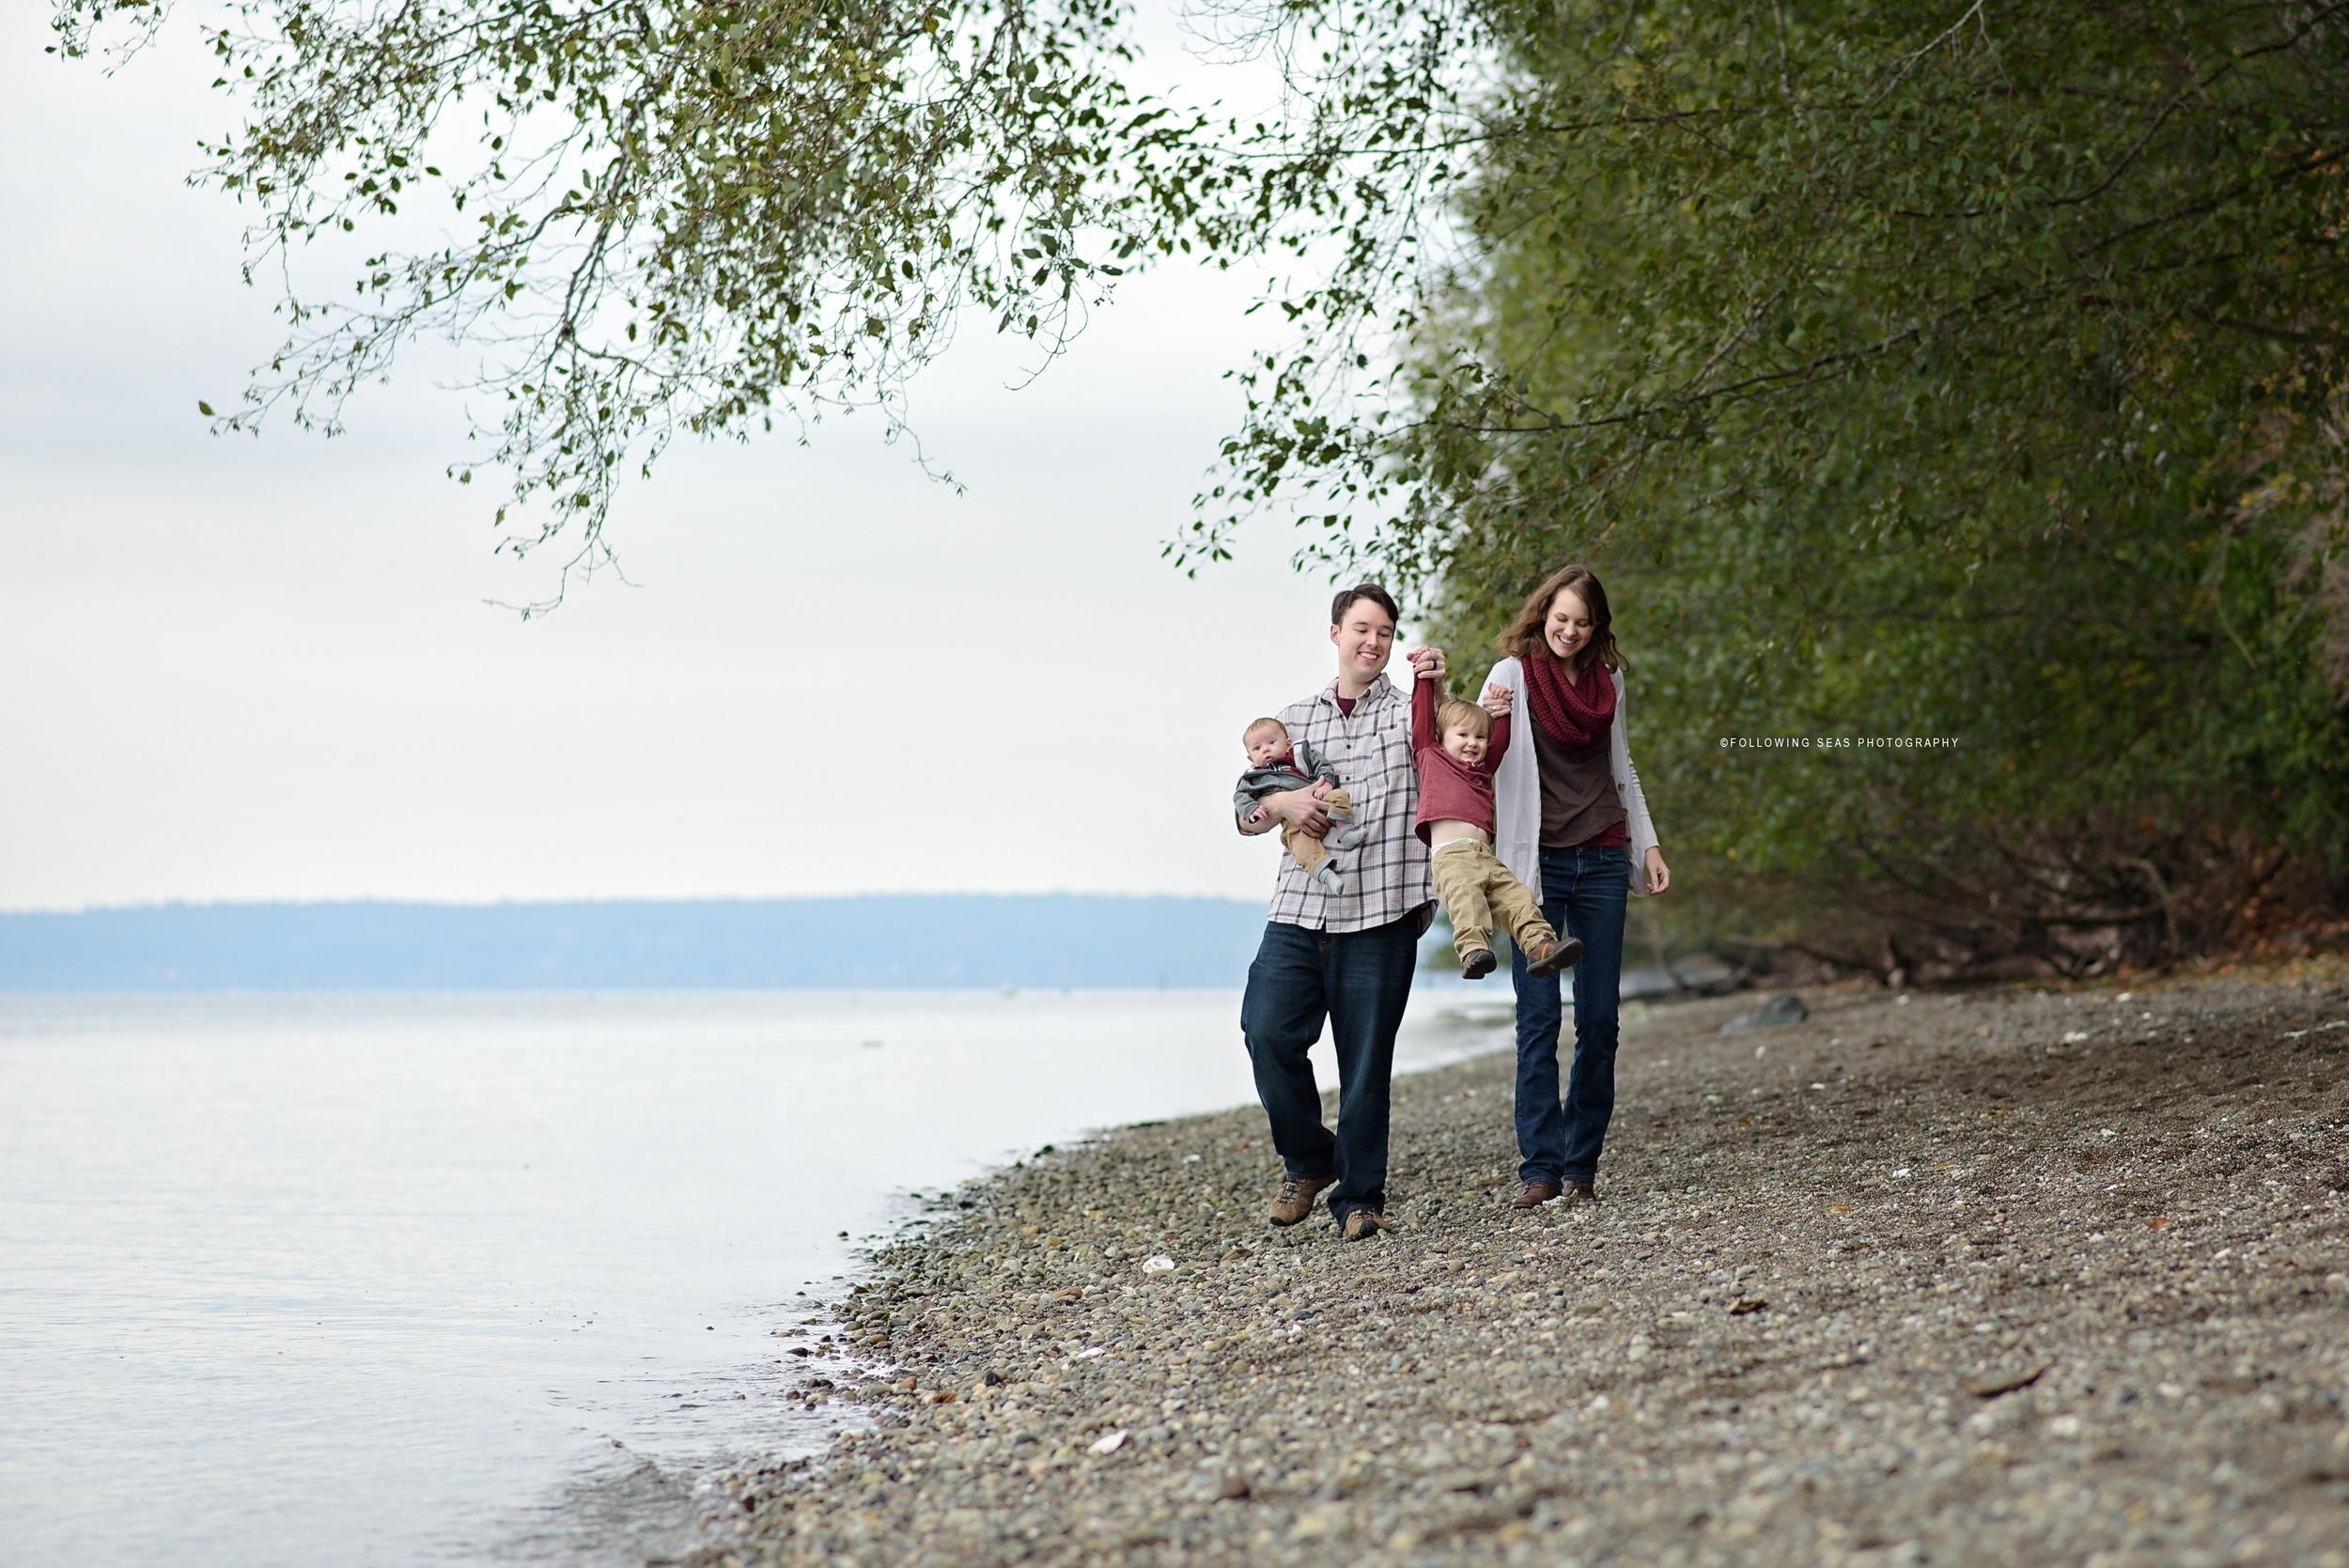 Bremerton-Family-Photographer-Following-Seas-Photography-52 copy.jpg